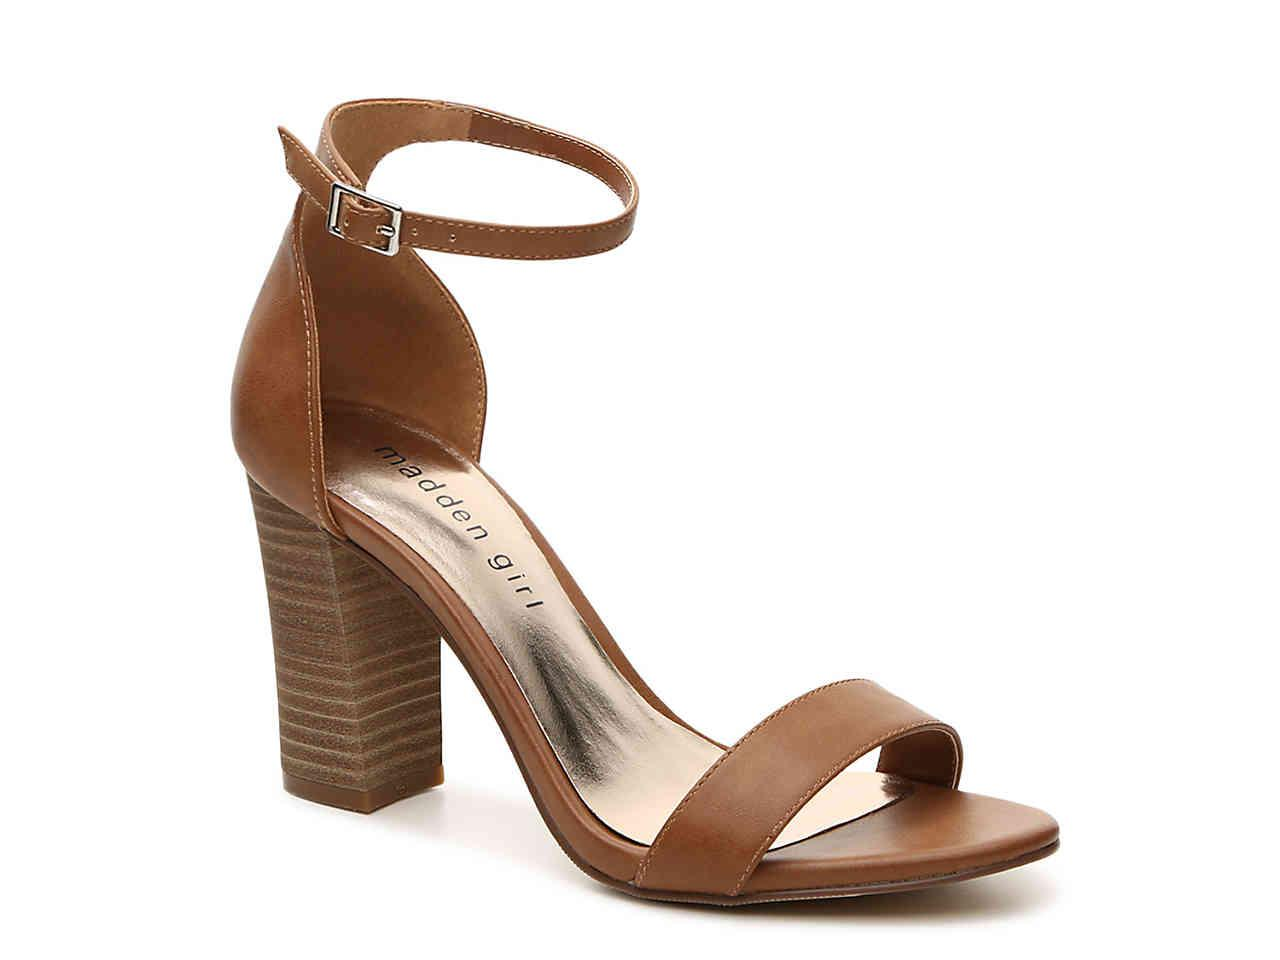 7426164002be10 Lyst - Madden Girl Bella Sandal in Brown